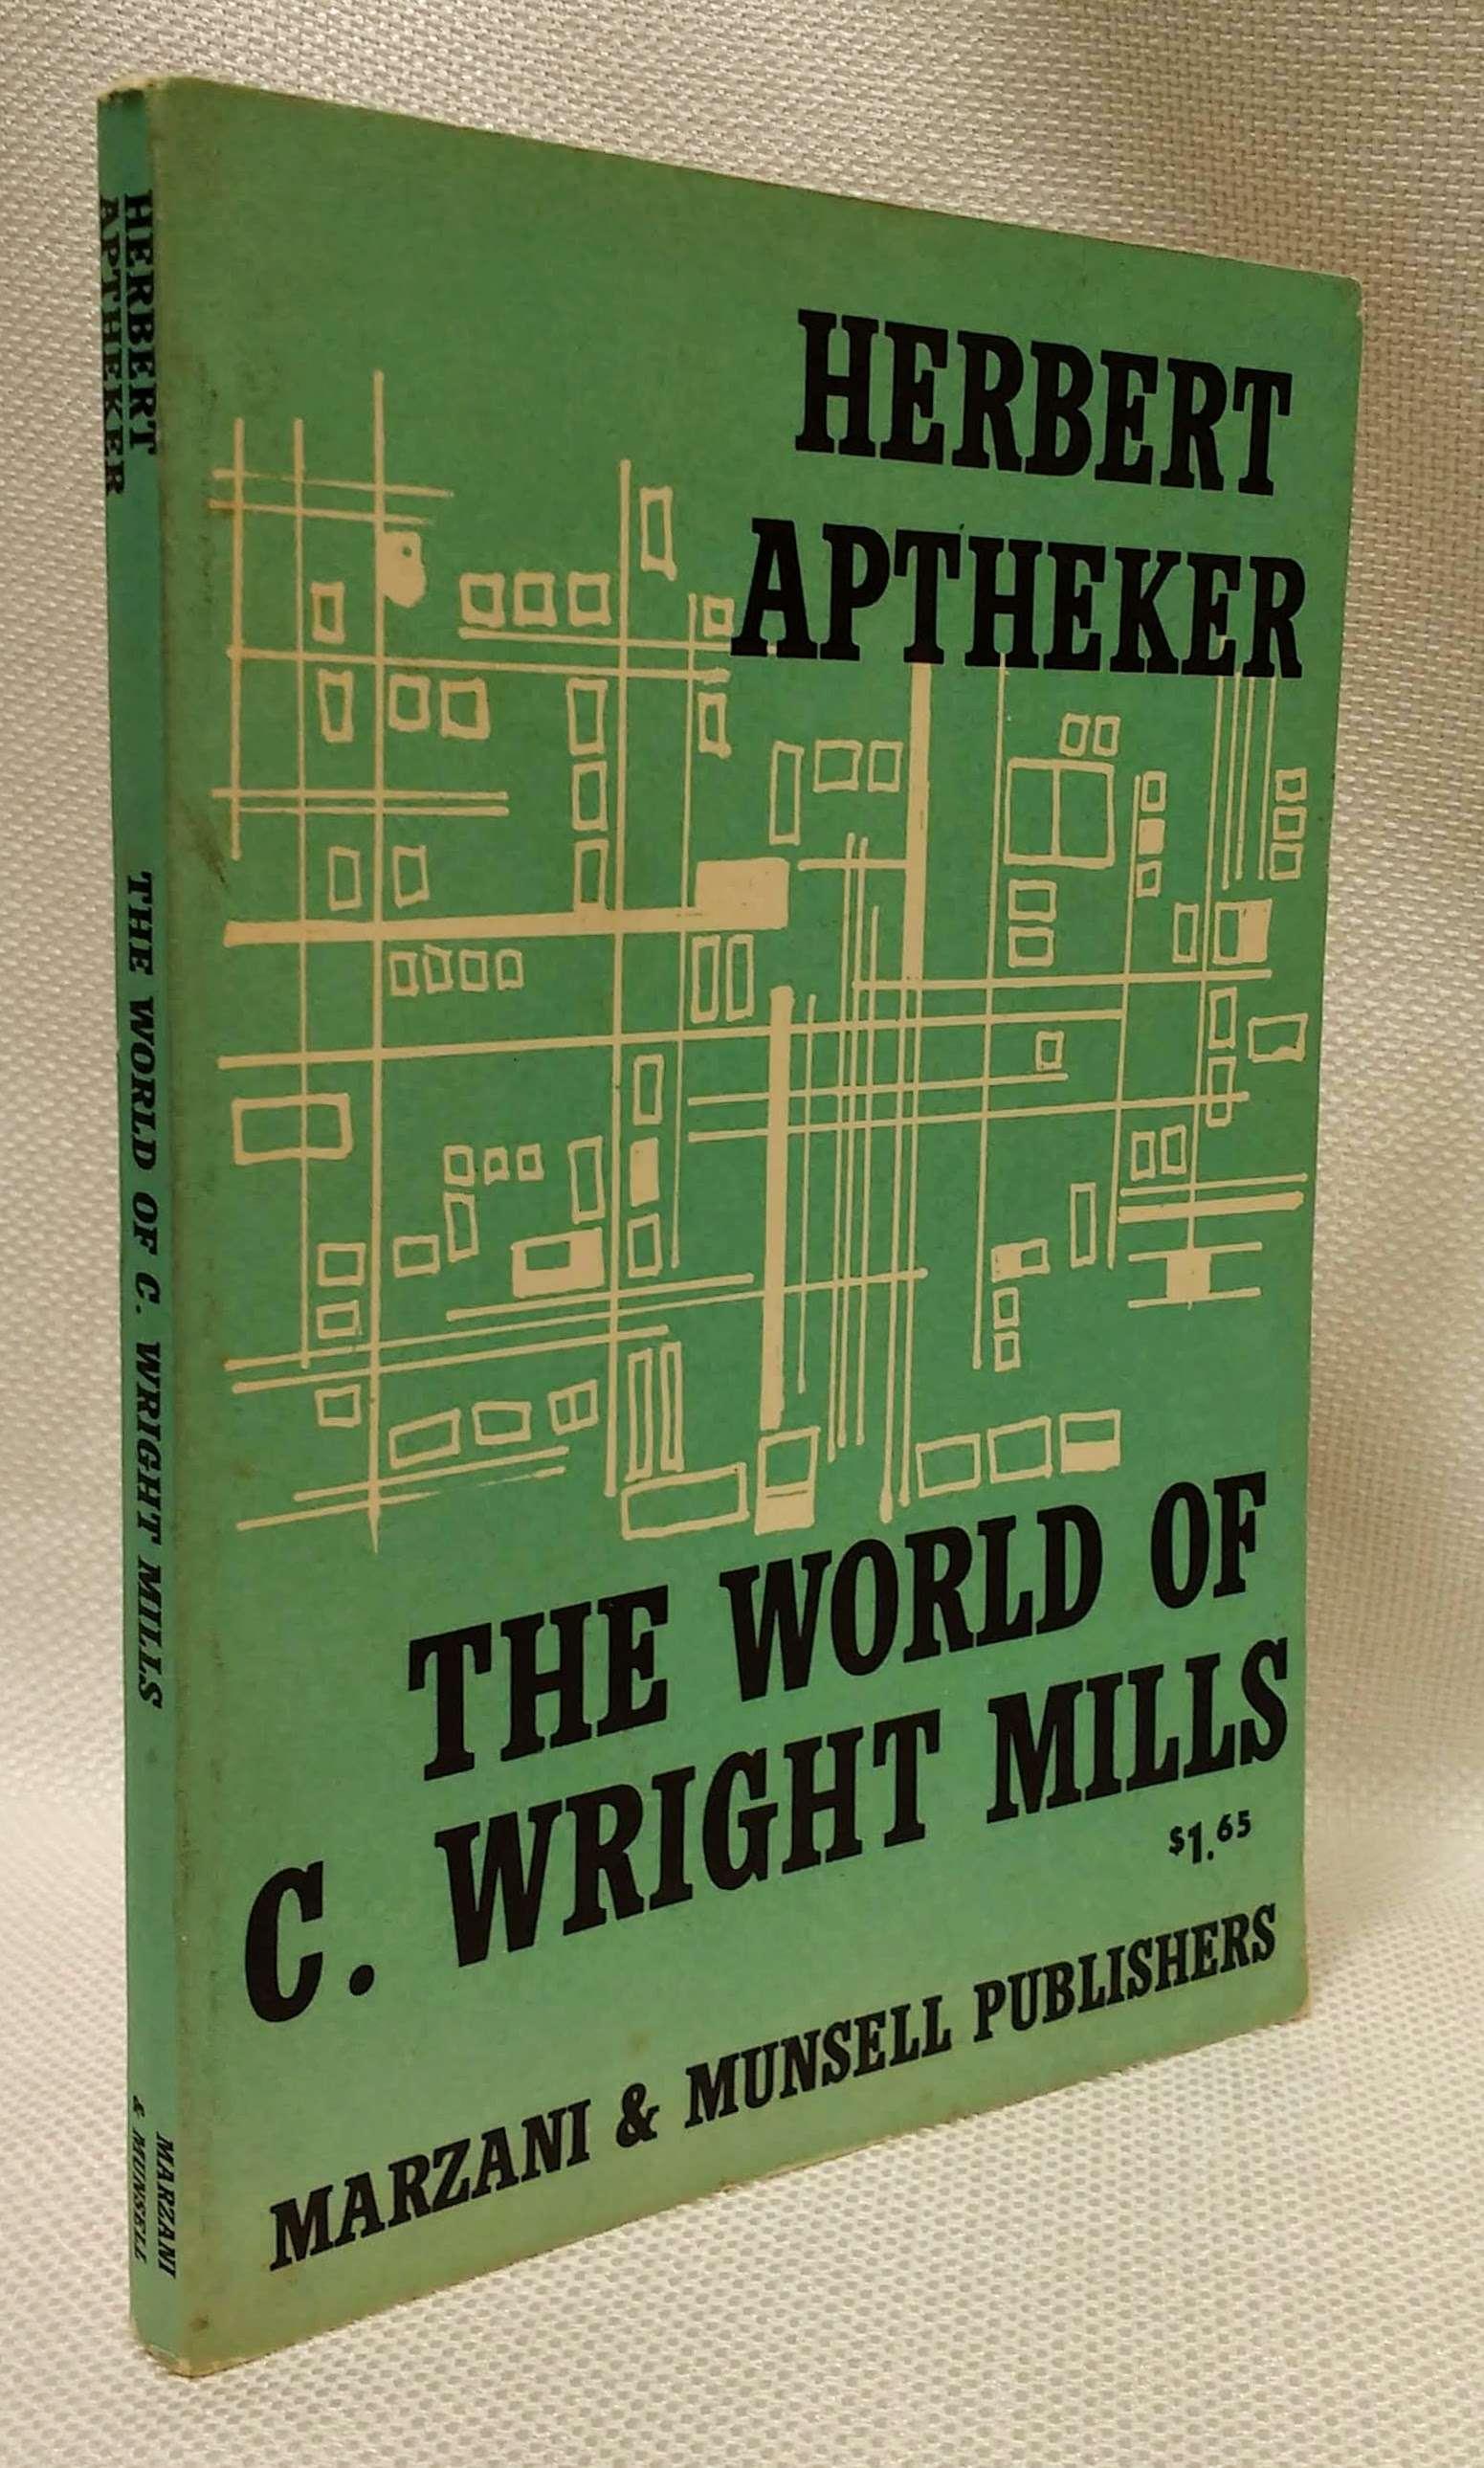 The World of C. Wright Mills, Aptheker, Herbert